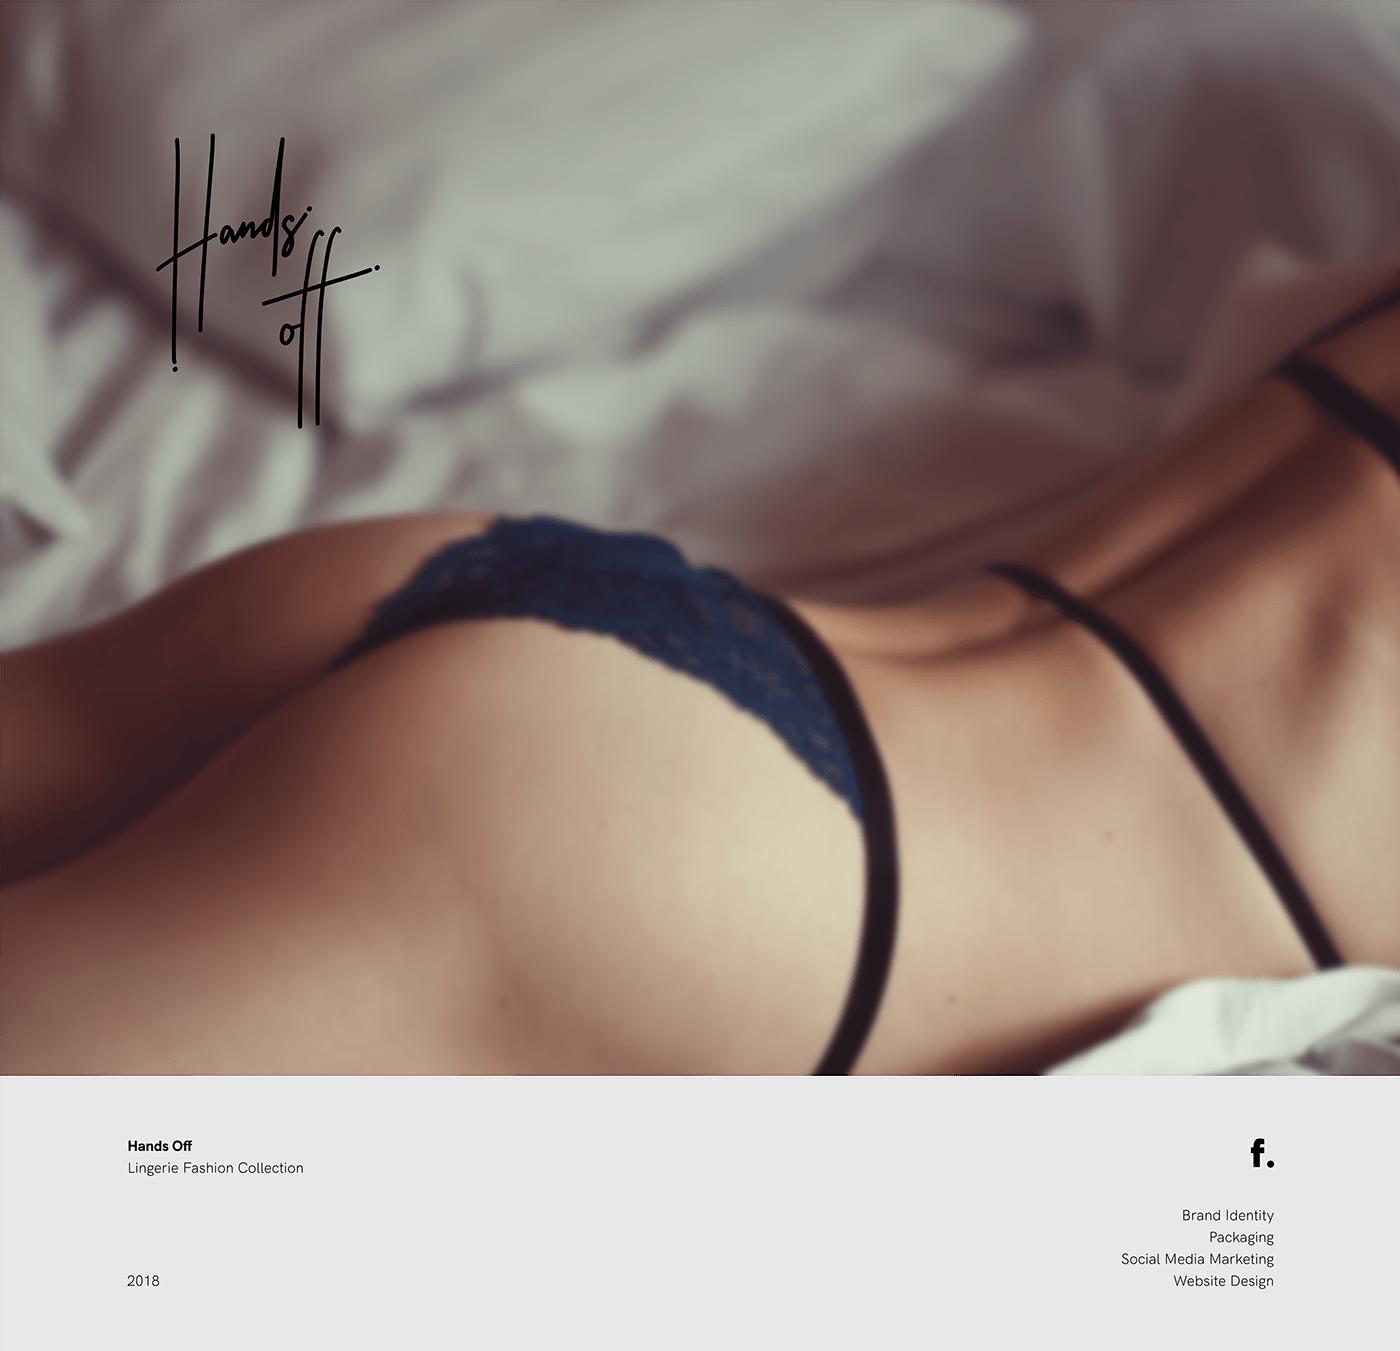 lingerie brand identity handwritten nude Fashion  hand tag feminine boutique women ladies